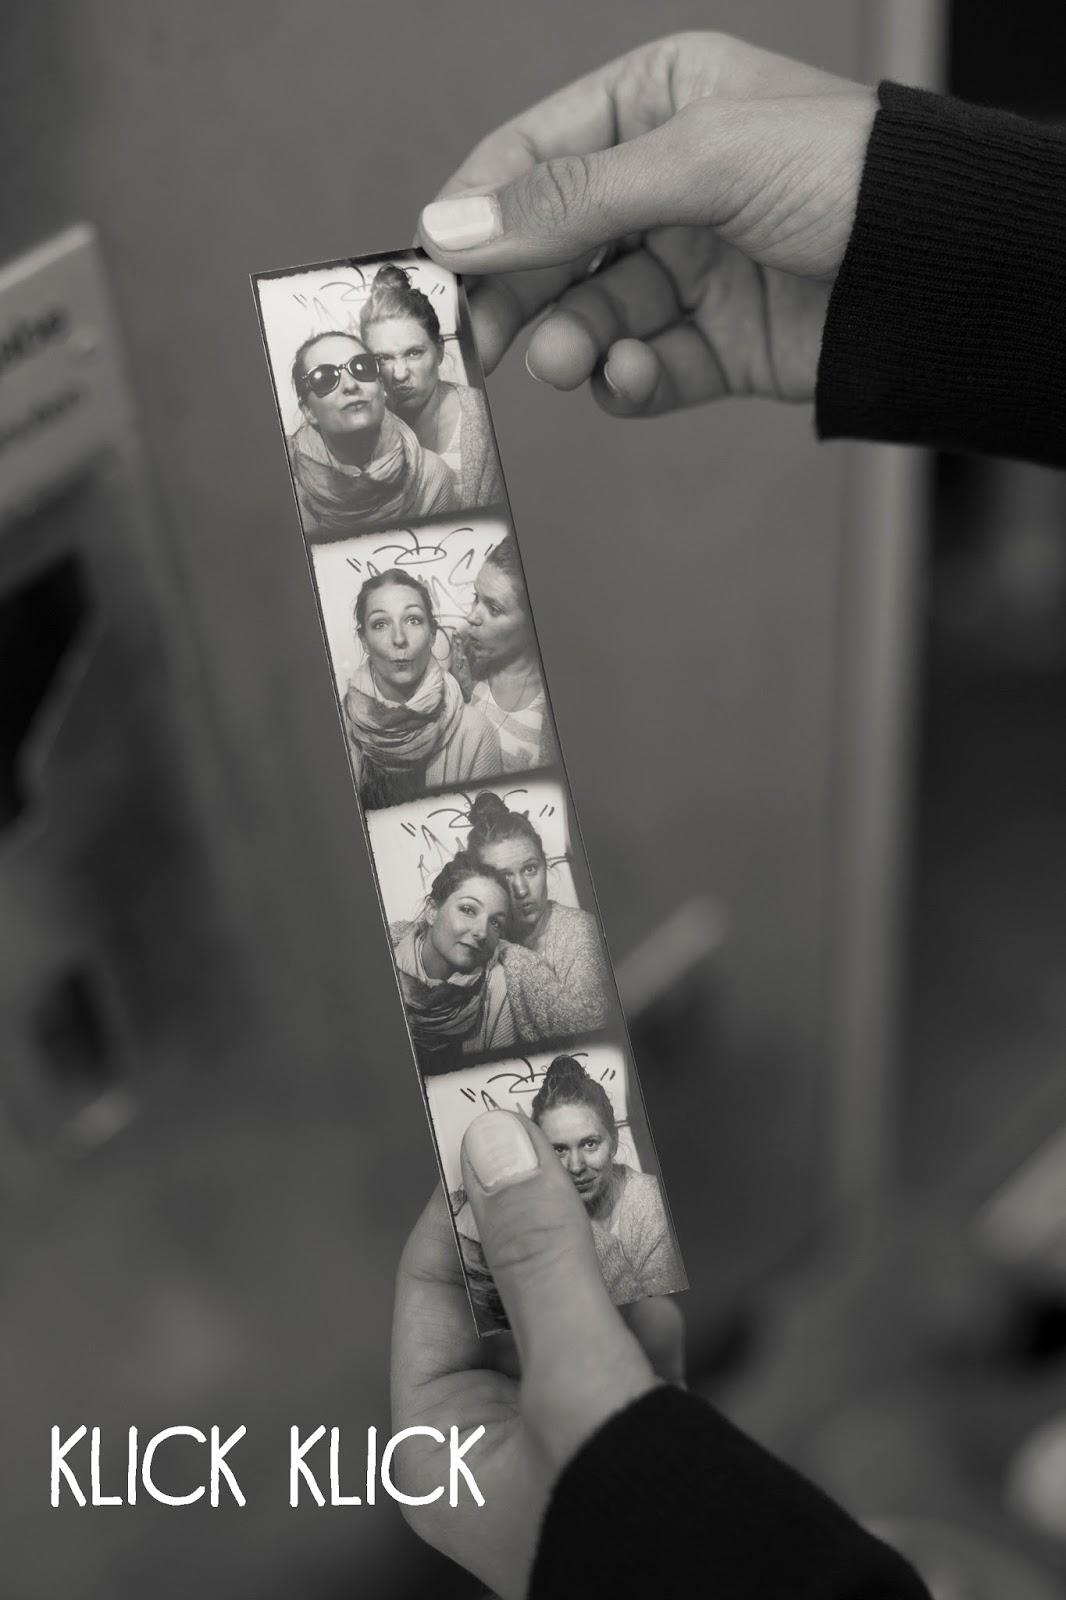 Quality Time - Elena und Jennie im Fotoaustomaten